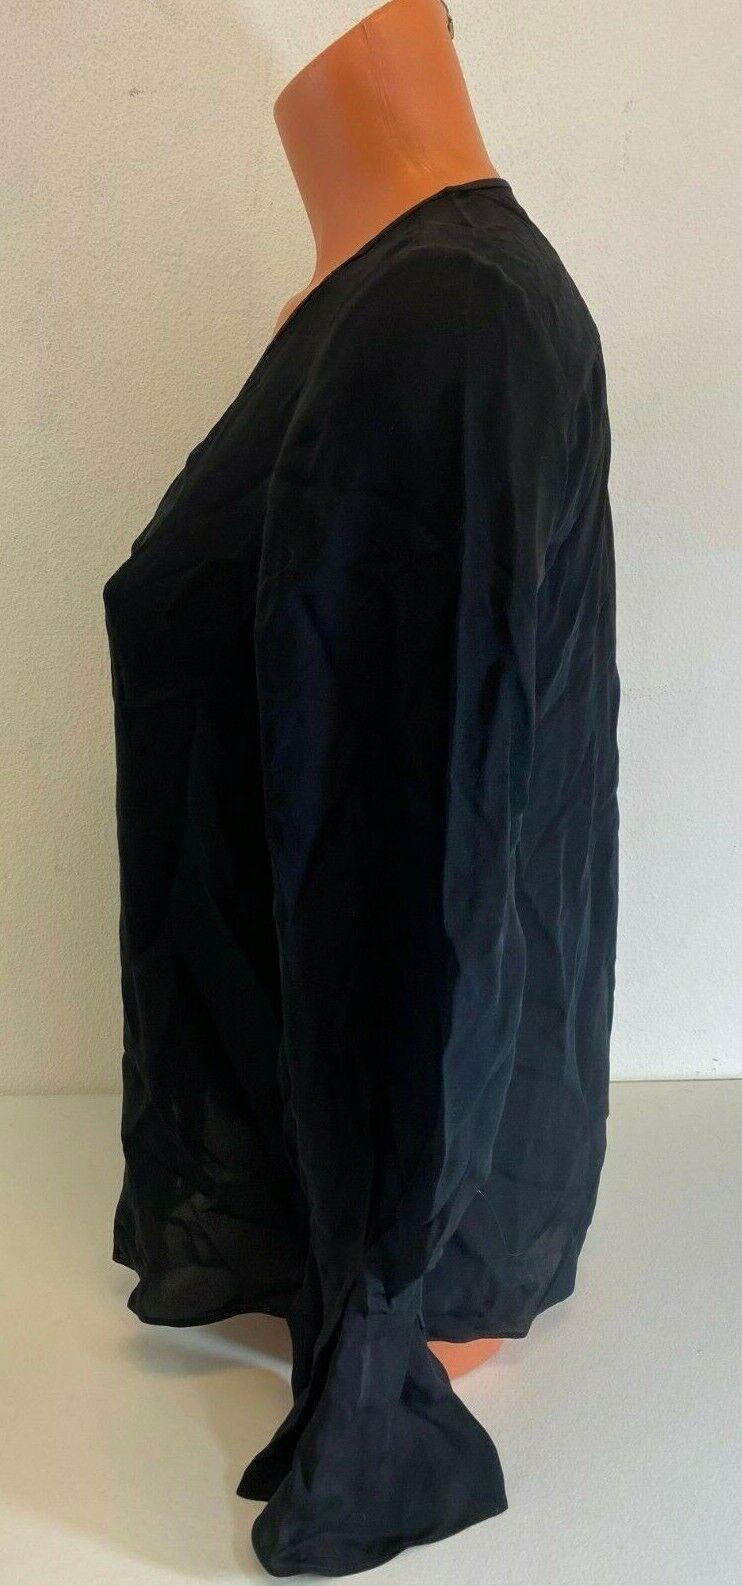 Estelle Womens Black Bell Sleeve V Neck Ribbed Blouse Top Plus 1X BHFO 5664